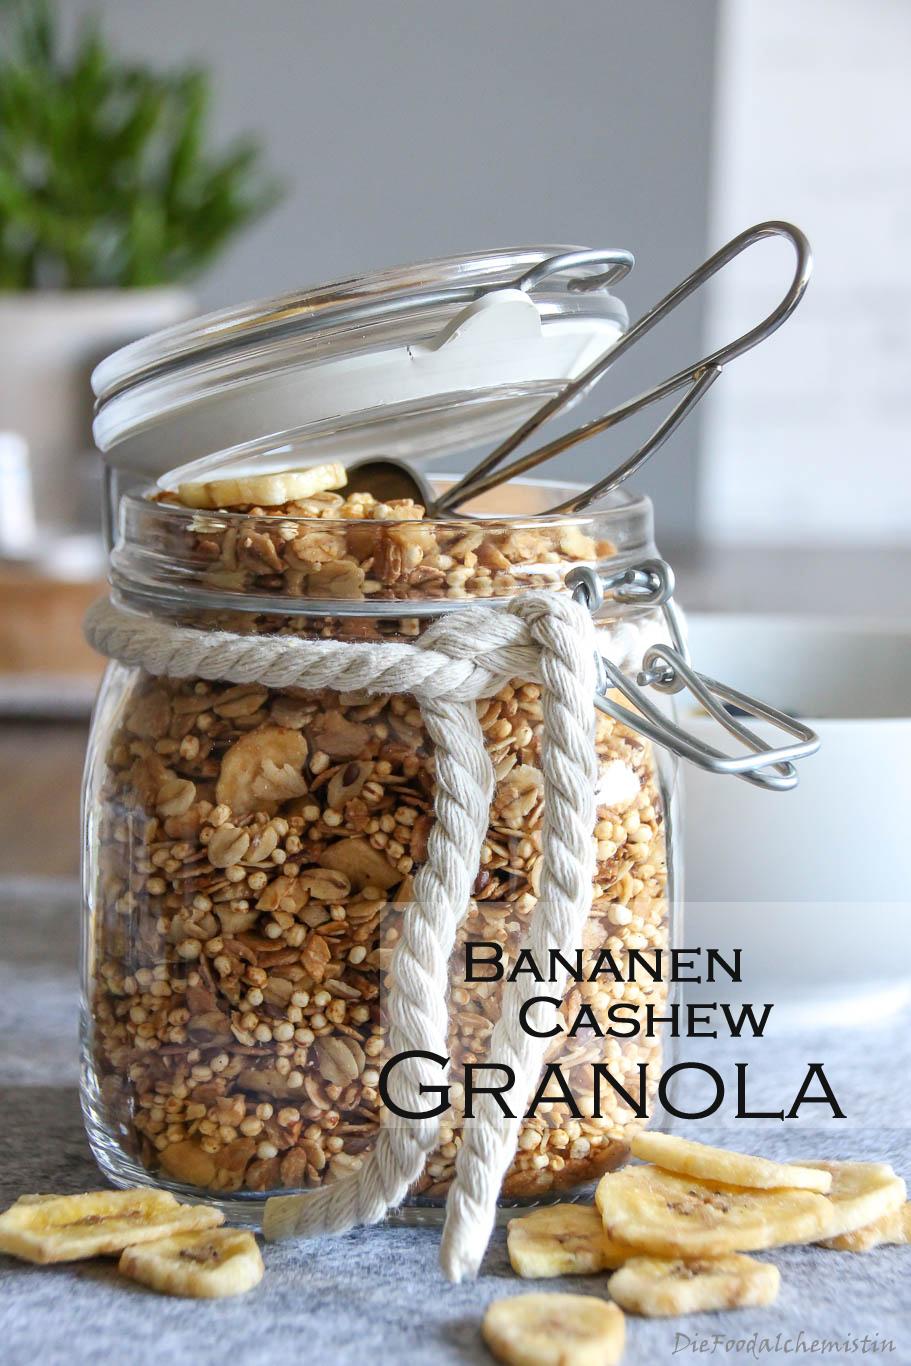 Bananen-Cashew-Granola4